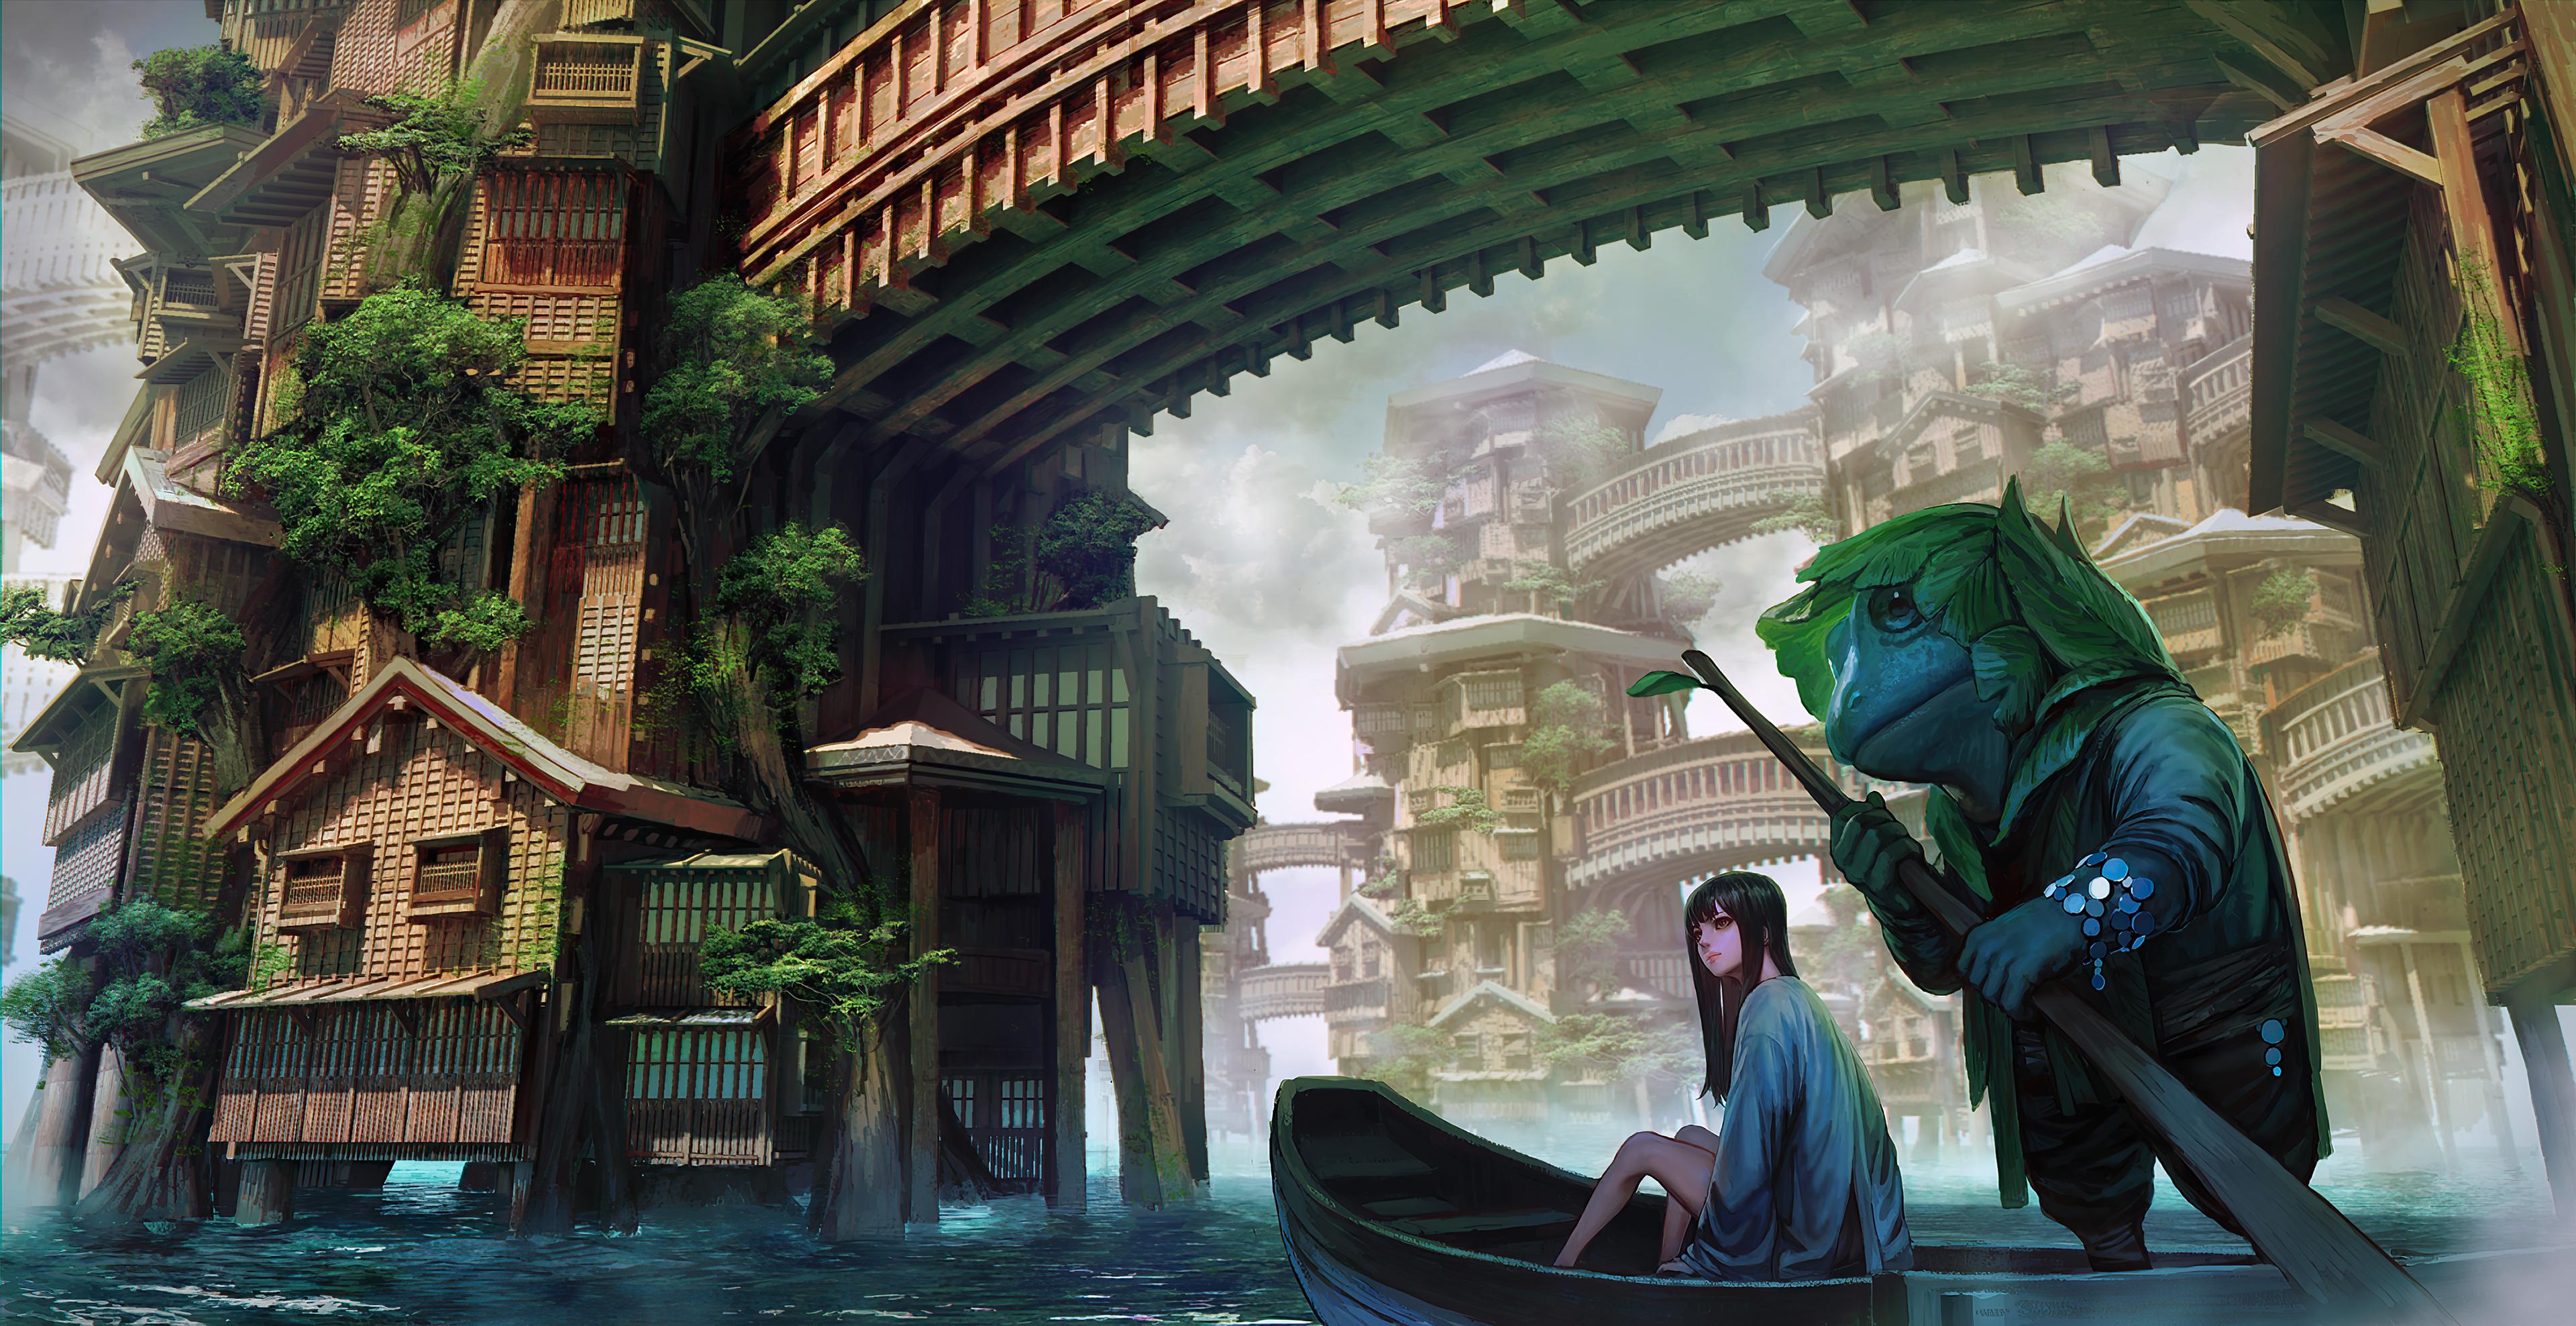 anime girl boat travelling dreamy world 4k 1602437882 - Anime Girl Boat Travelling Dreamy World 4k - Anime Girl Boat Travelling Dreamy World 4k wallpapers